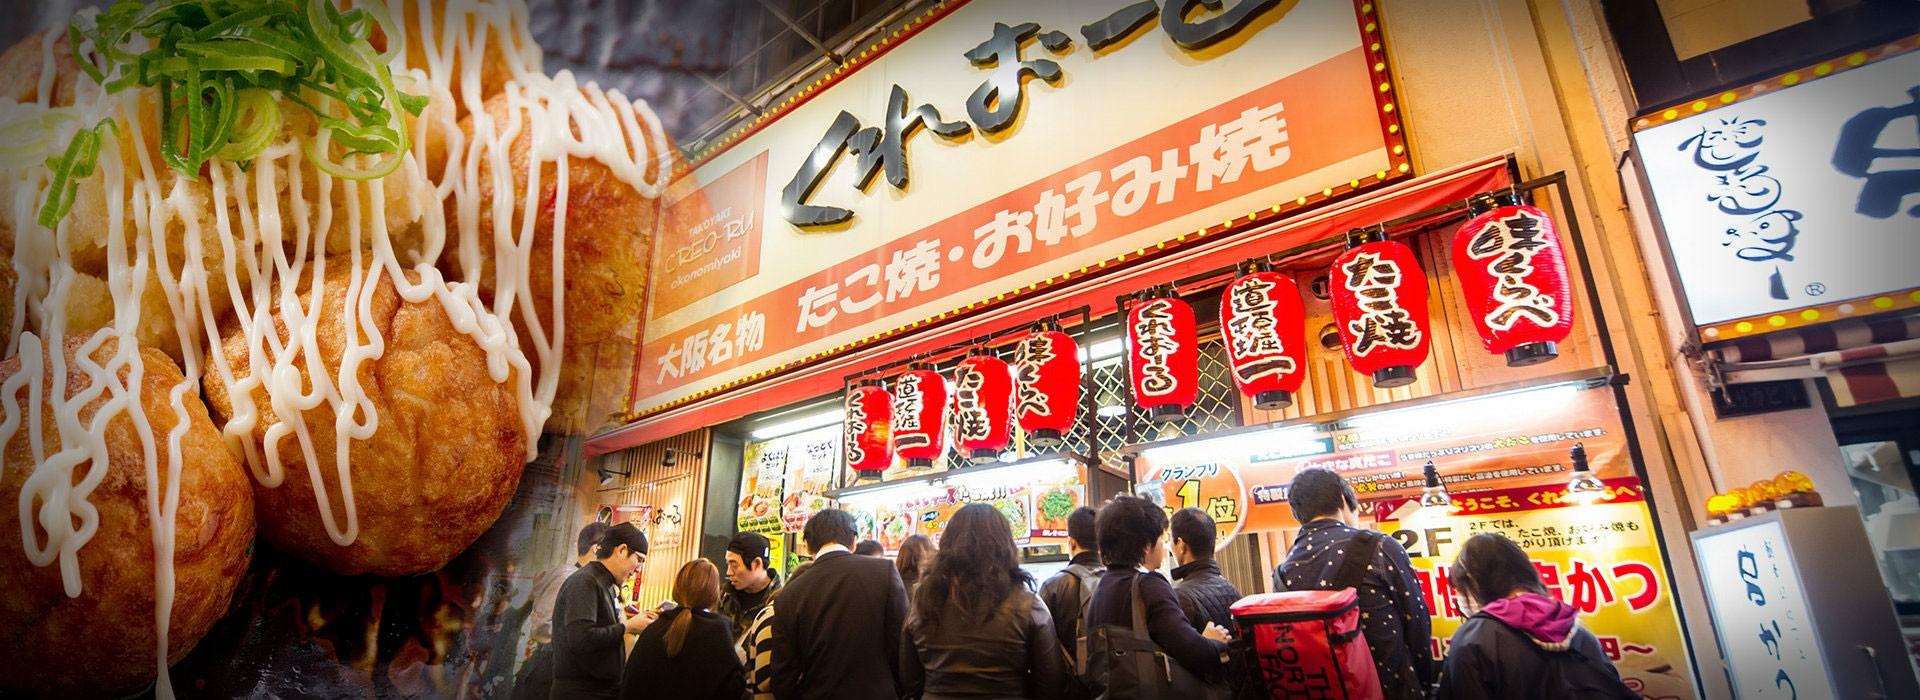 Creo-Ru : Takoyaki & Okonomiyaki Osaka Specialty